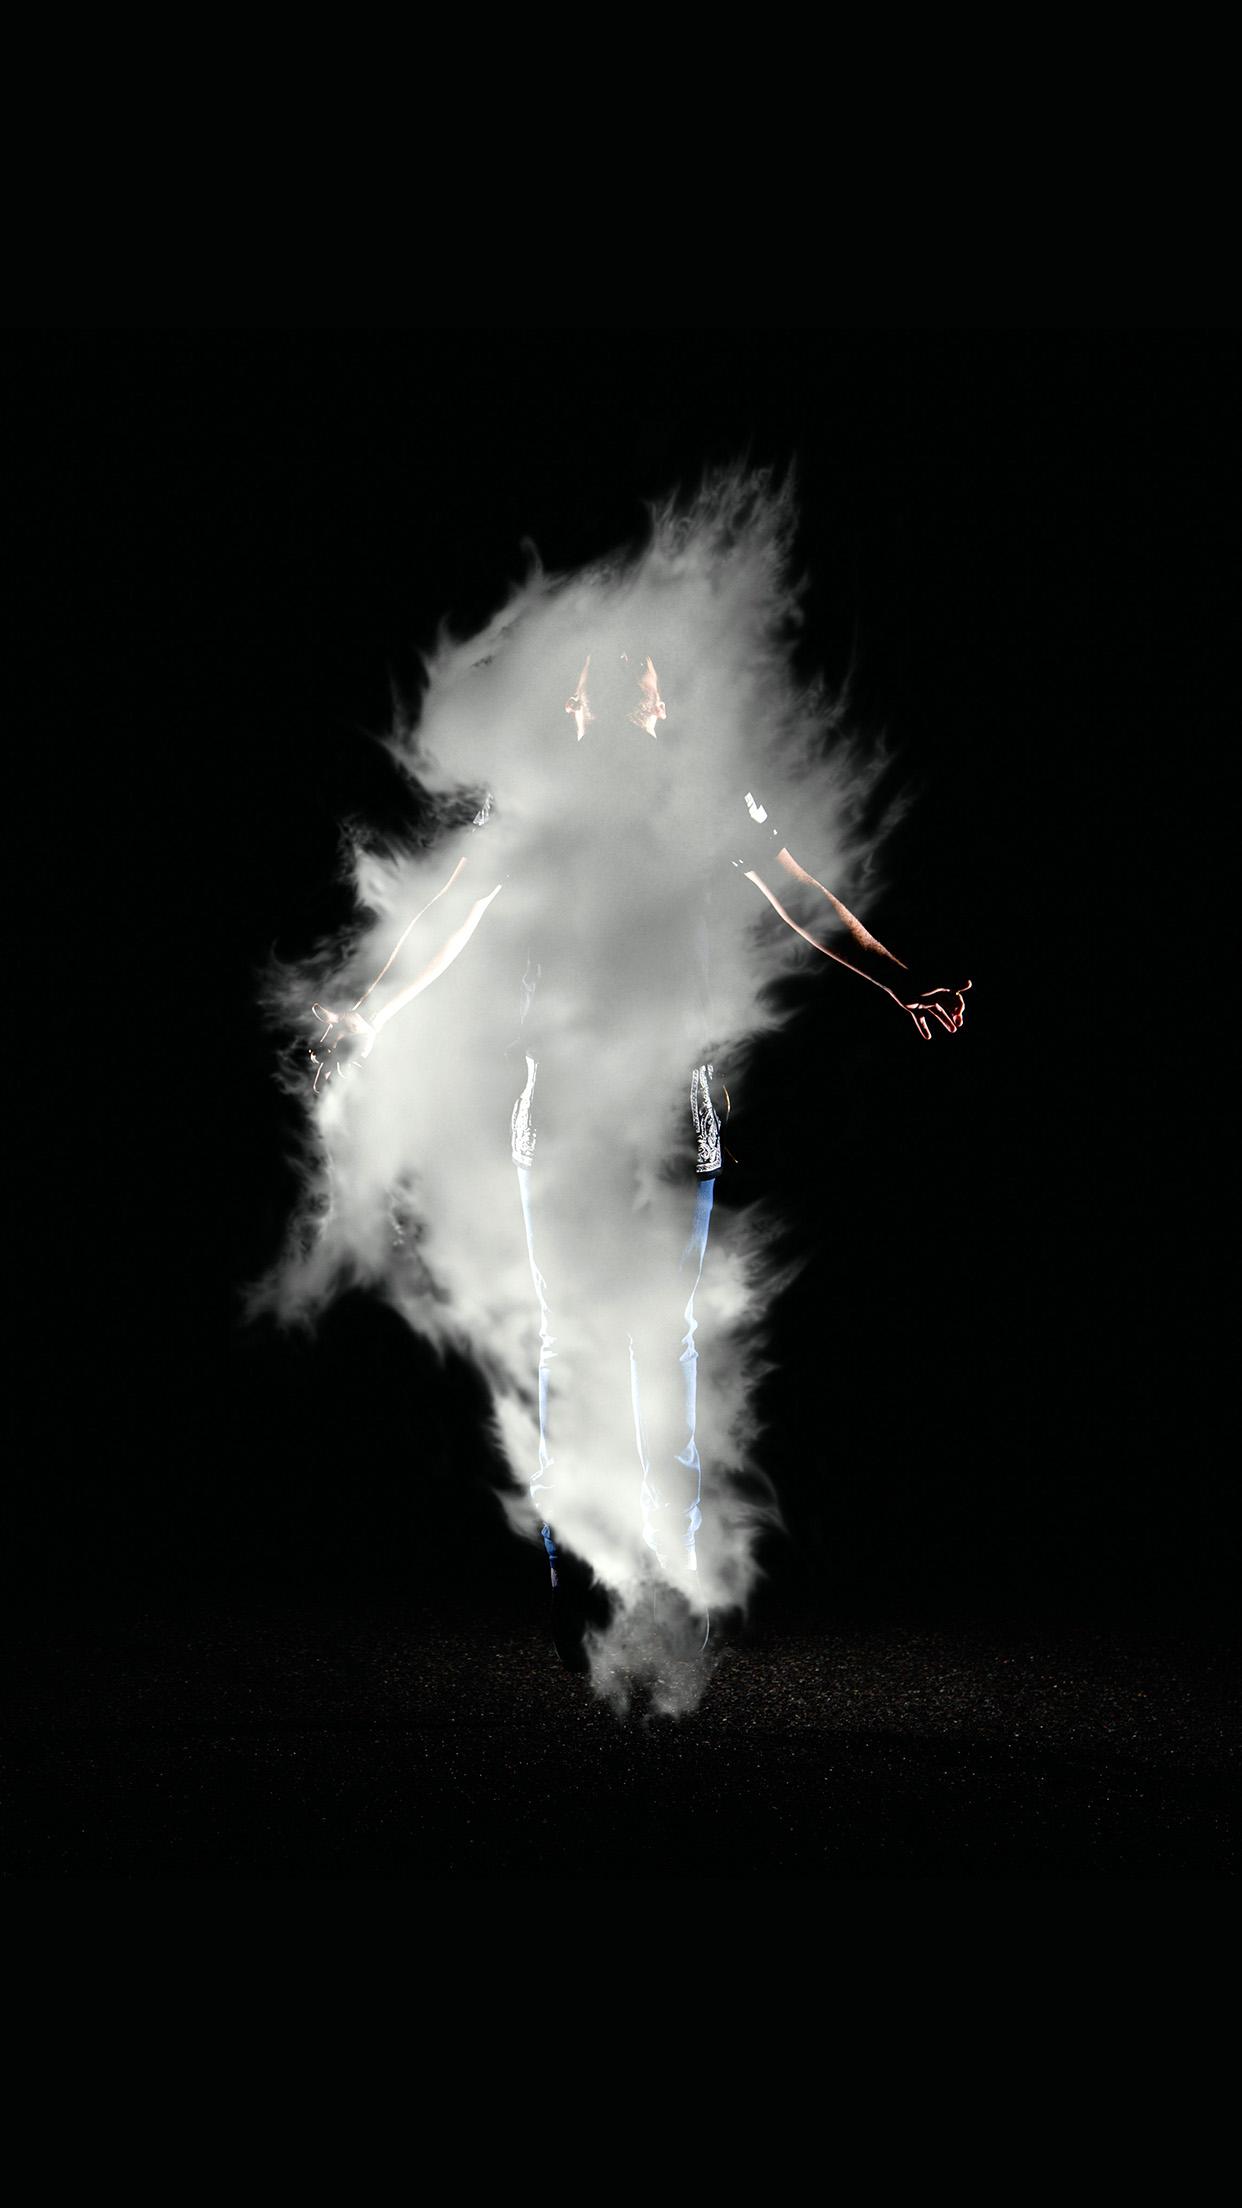 Iphonexpapers Com Iphone X Wallpaper Az49 Man Dark Smoke Illustration Art Black